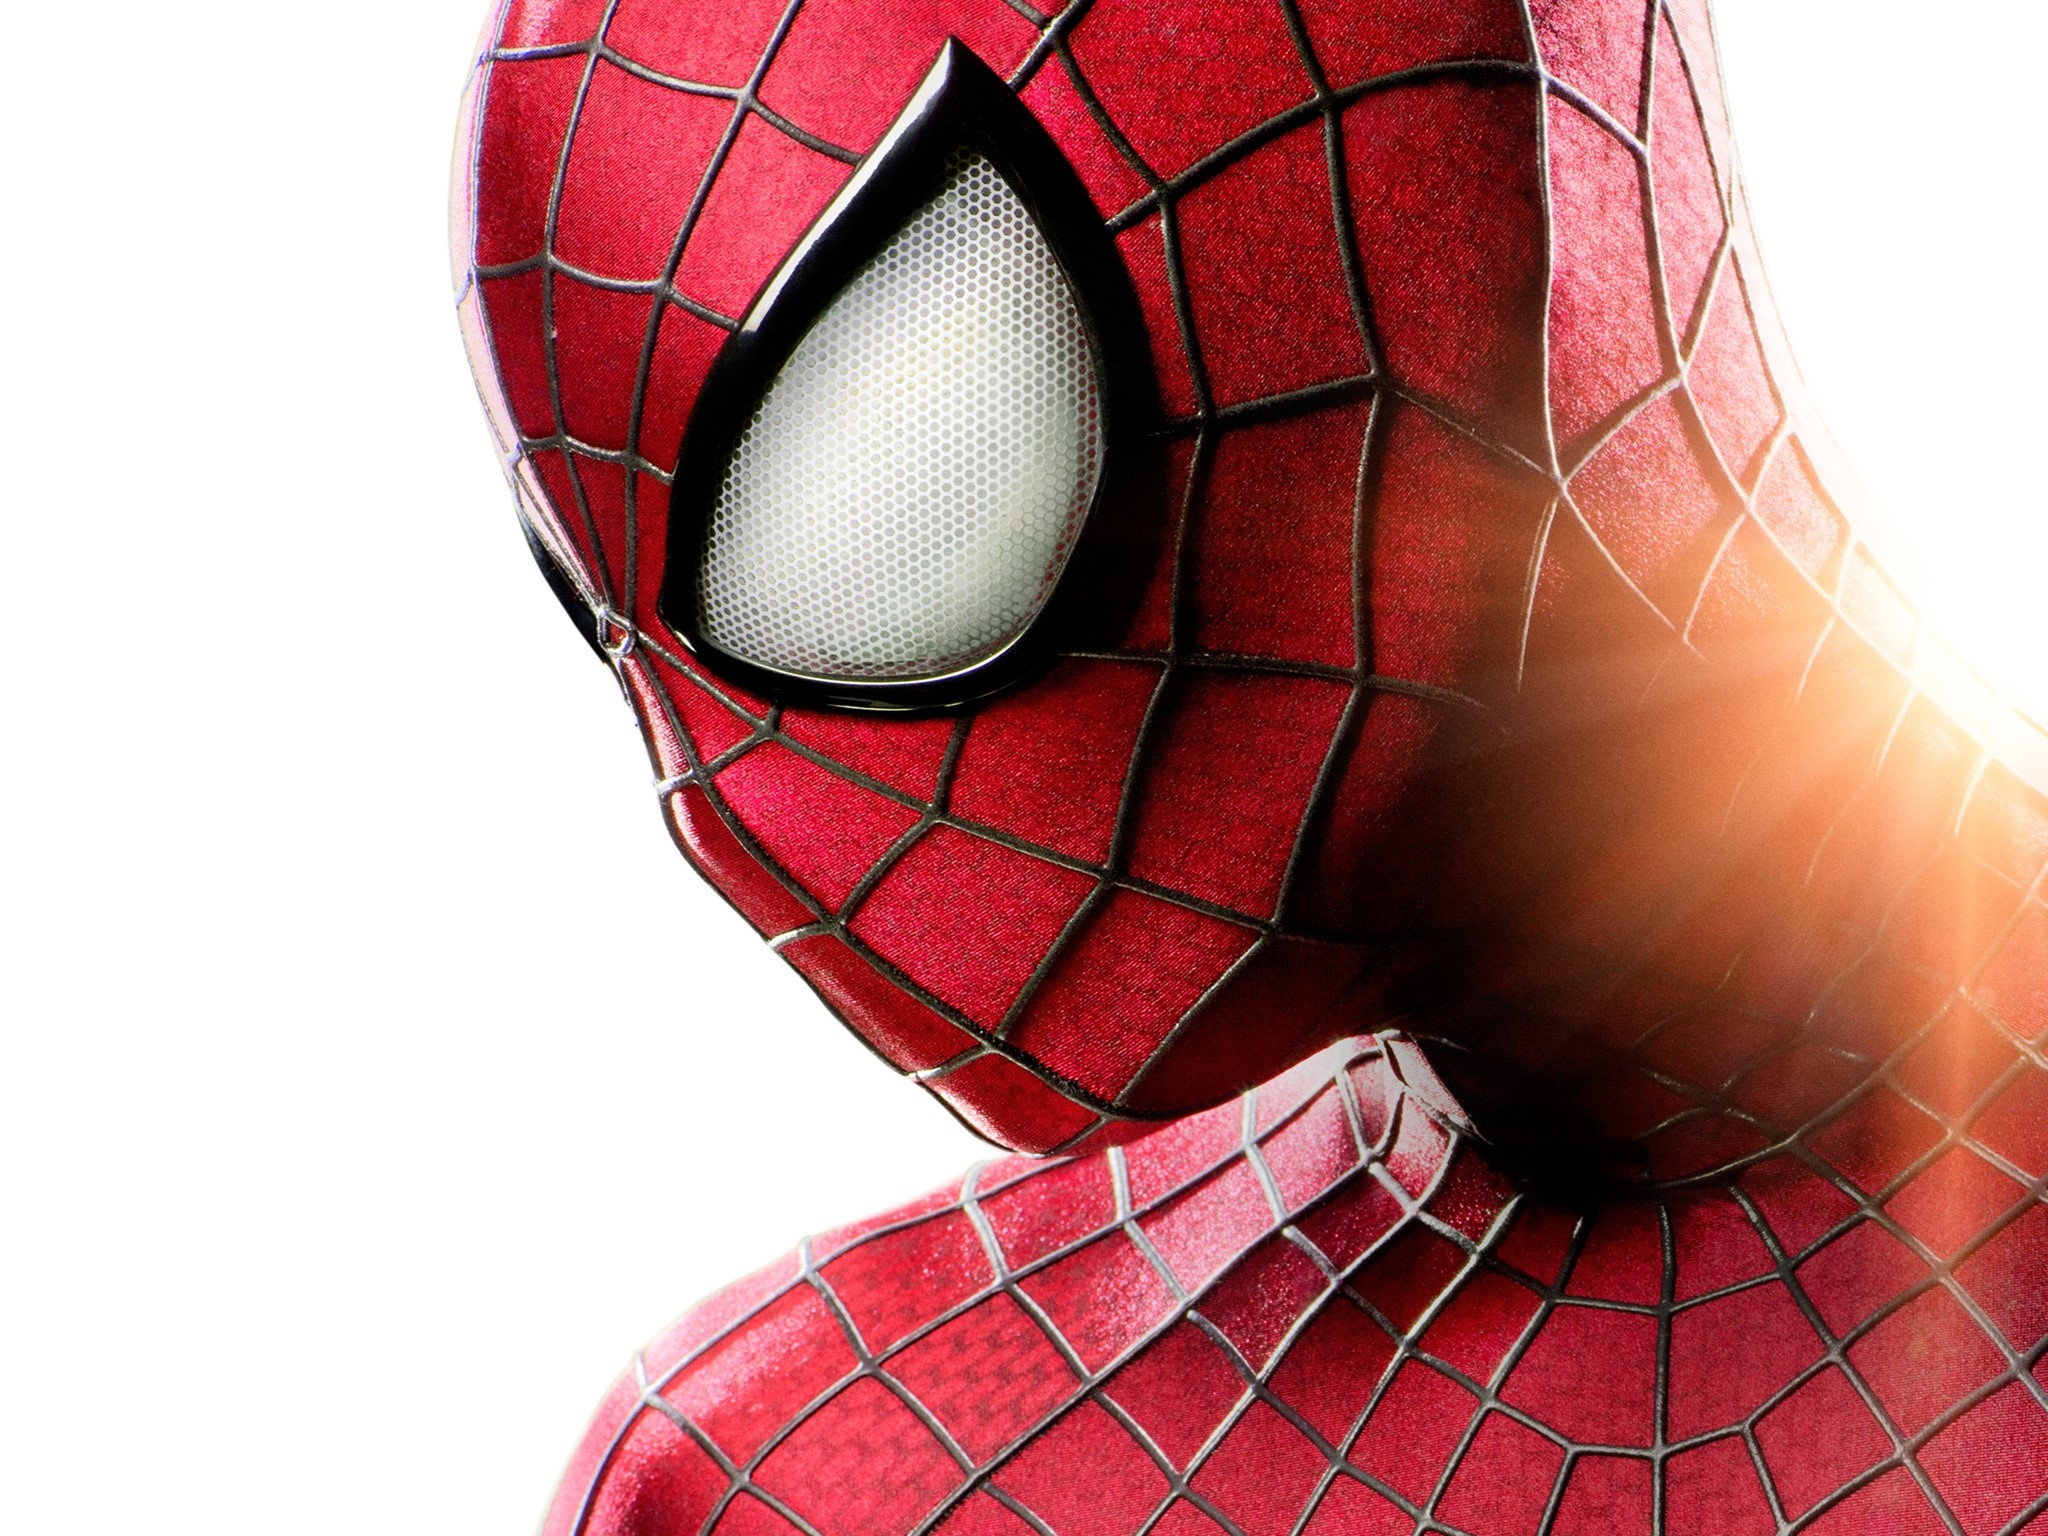 Fondos de pantalla El maravilloso hombre araña 2